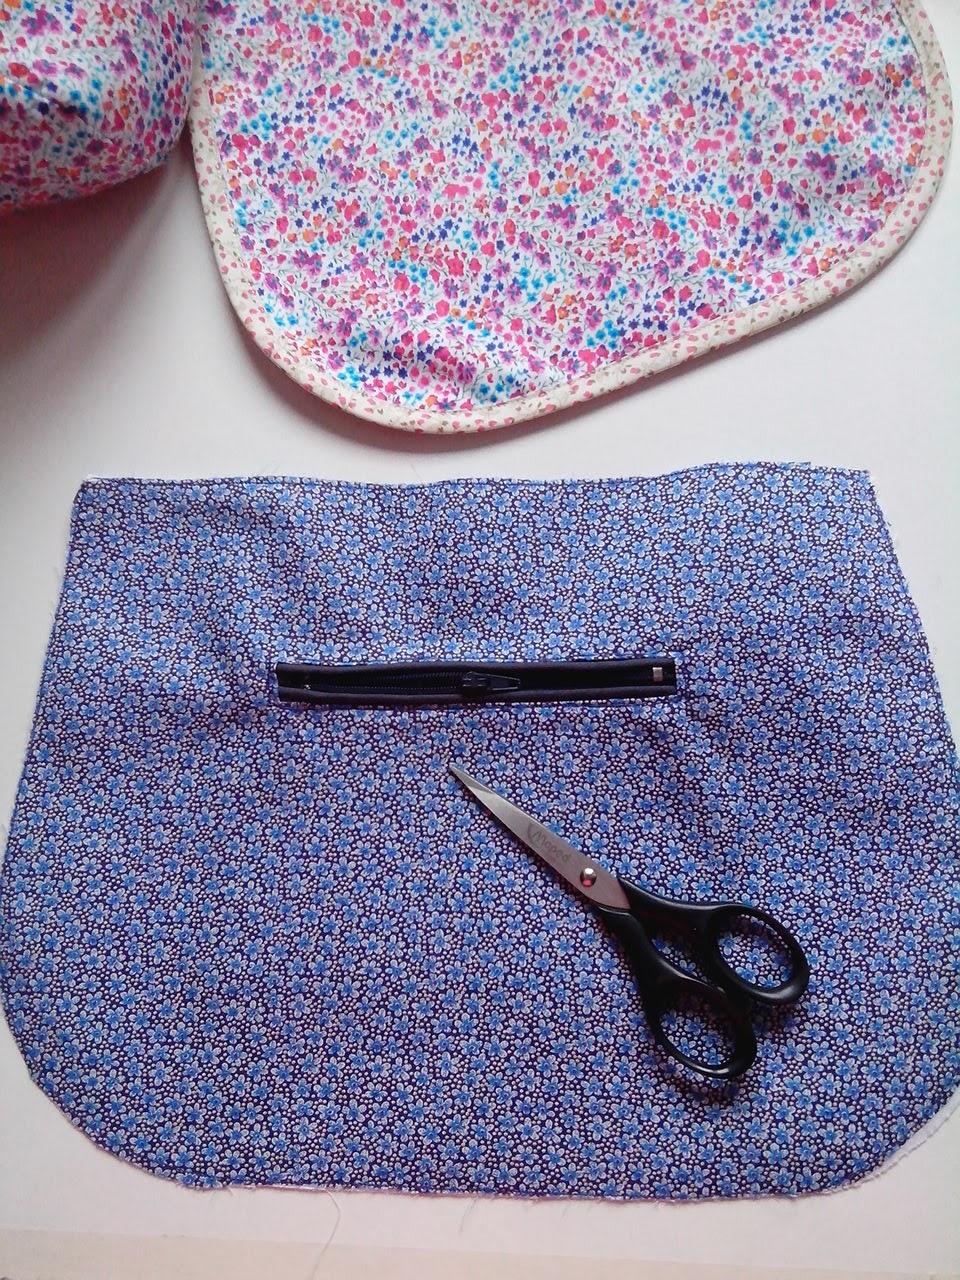 Couture loisir sac besace coudre une poche passepoil e - Coudre une poche plaquee ...